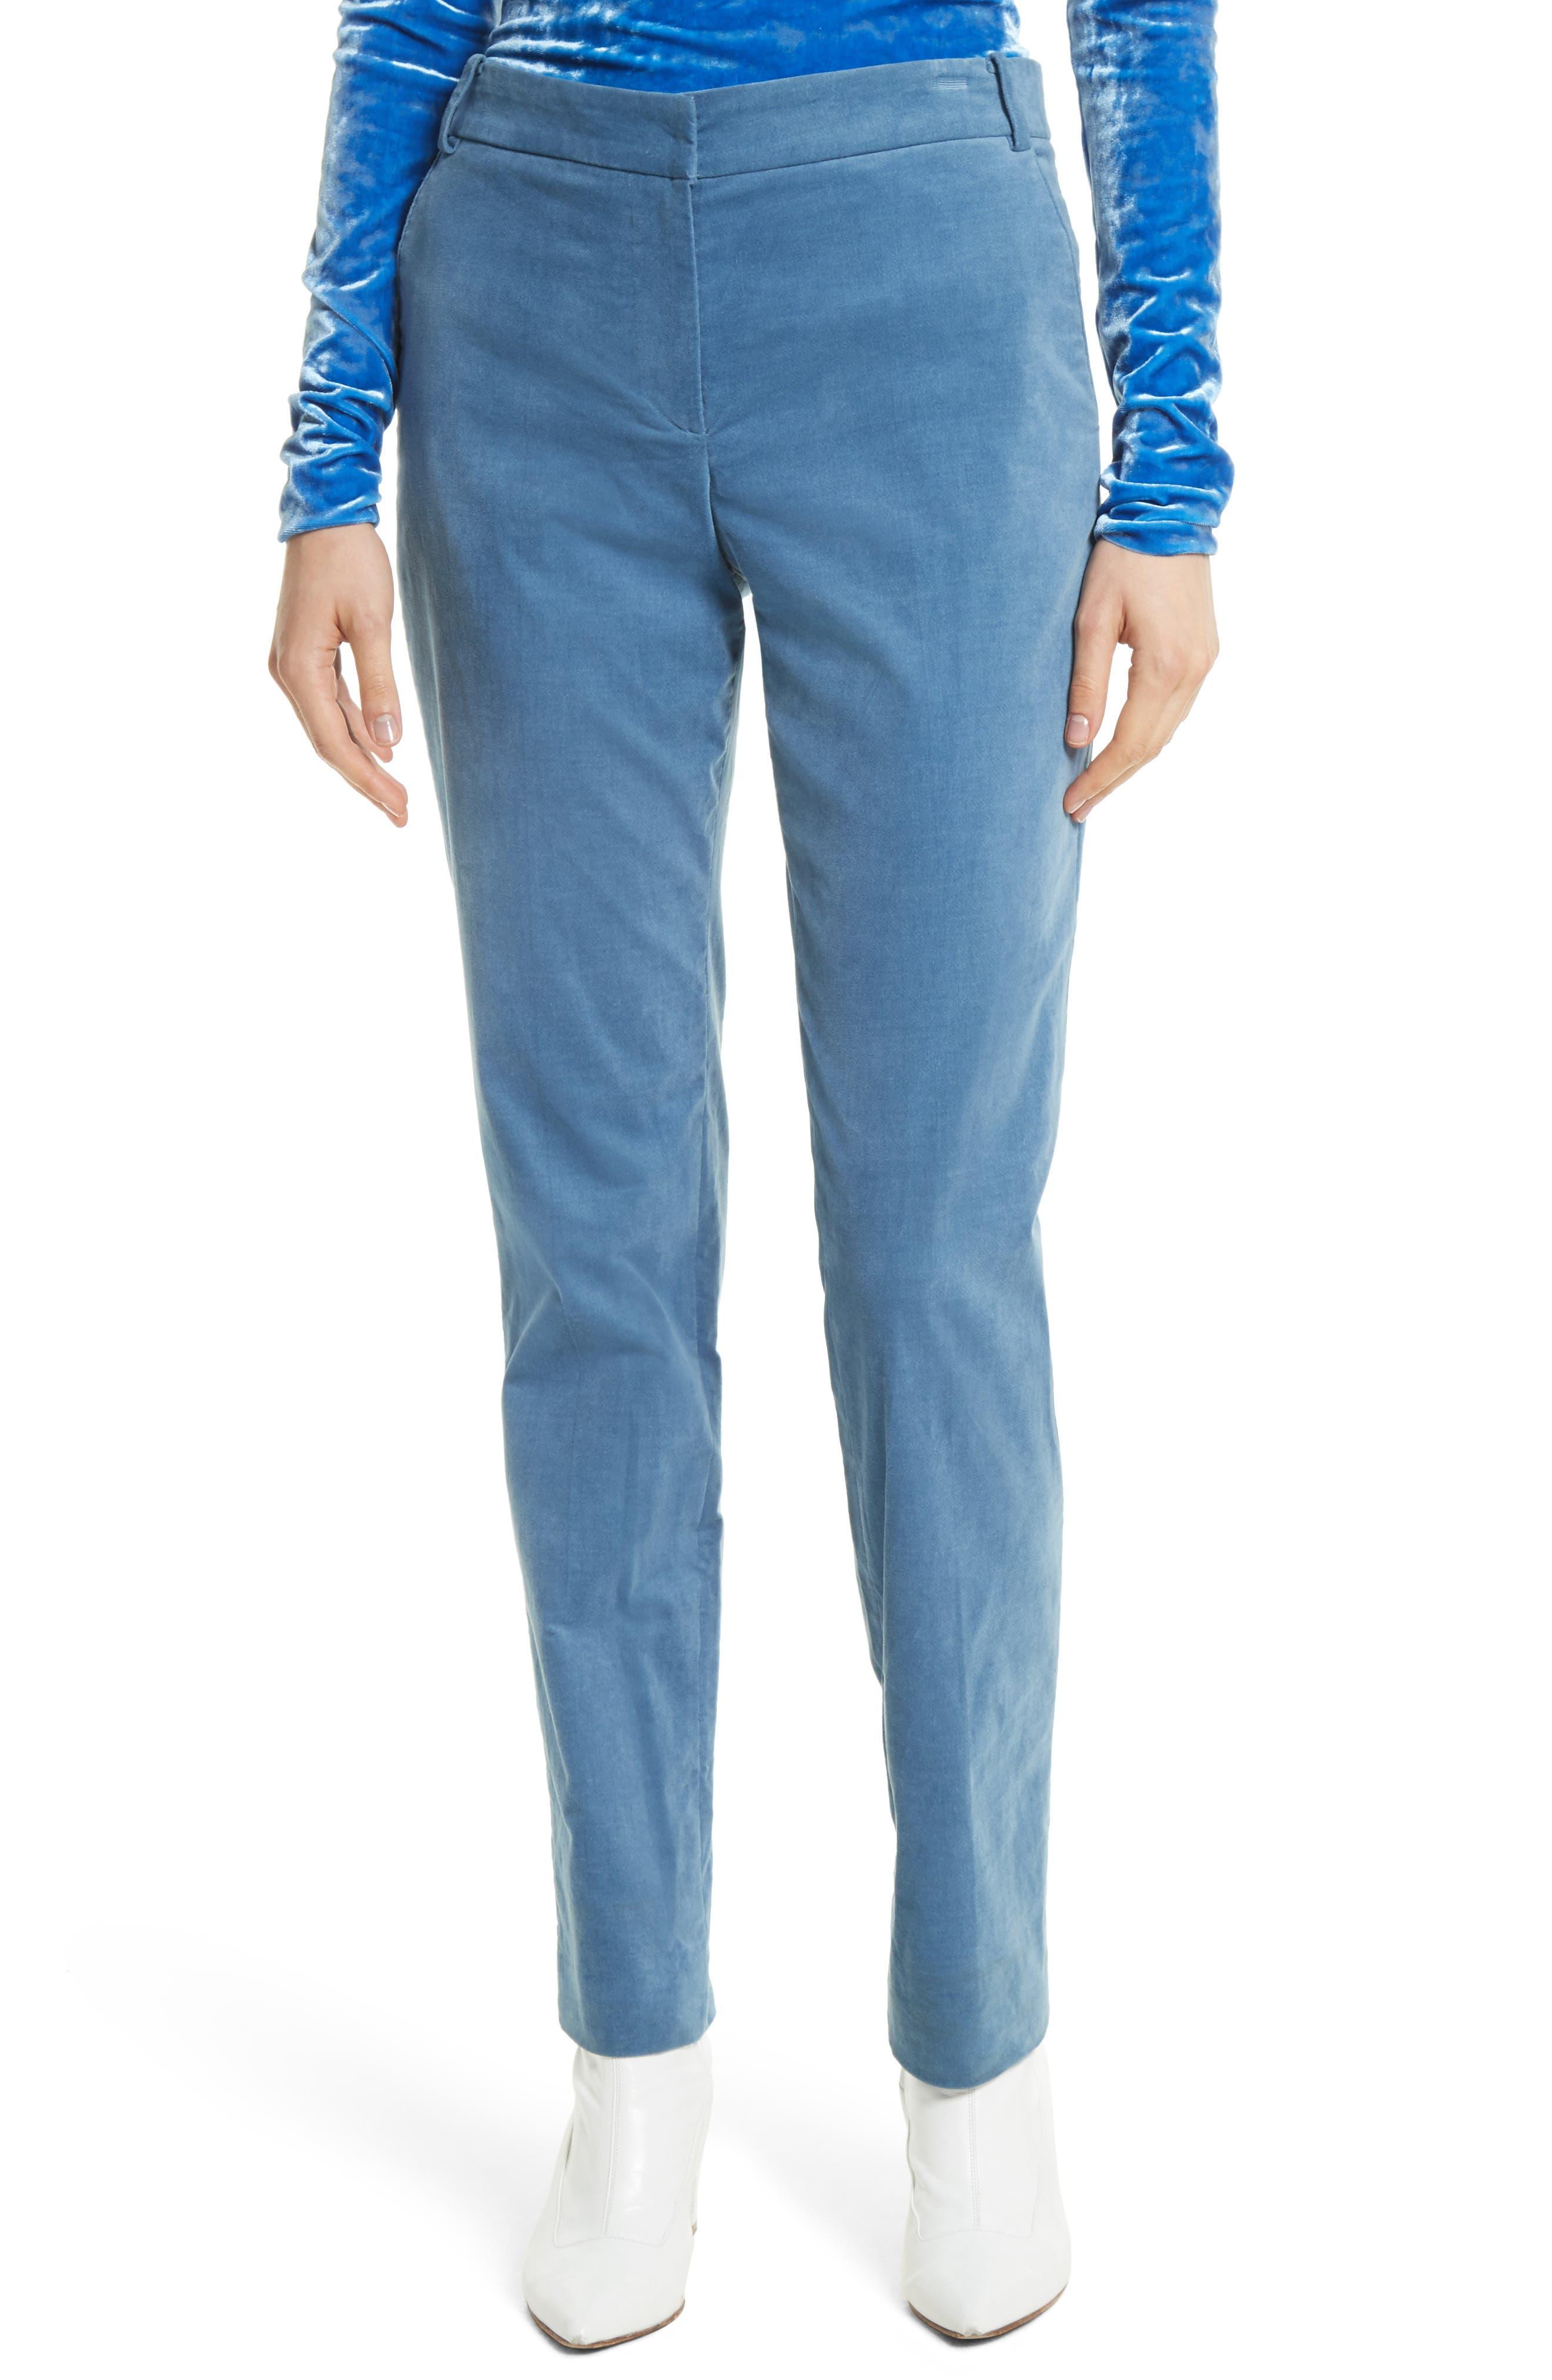 Moleskin Stretch Cotton Skinny Pants,                         Main,                         color, 400